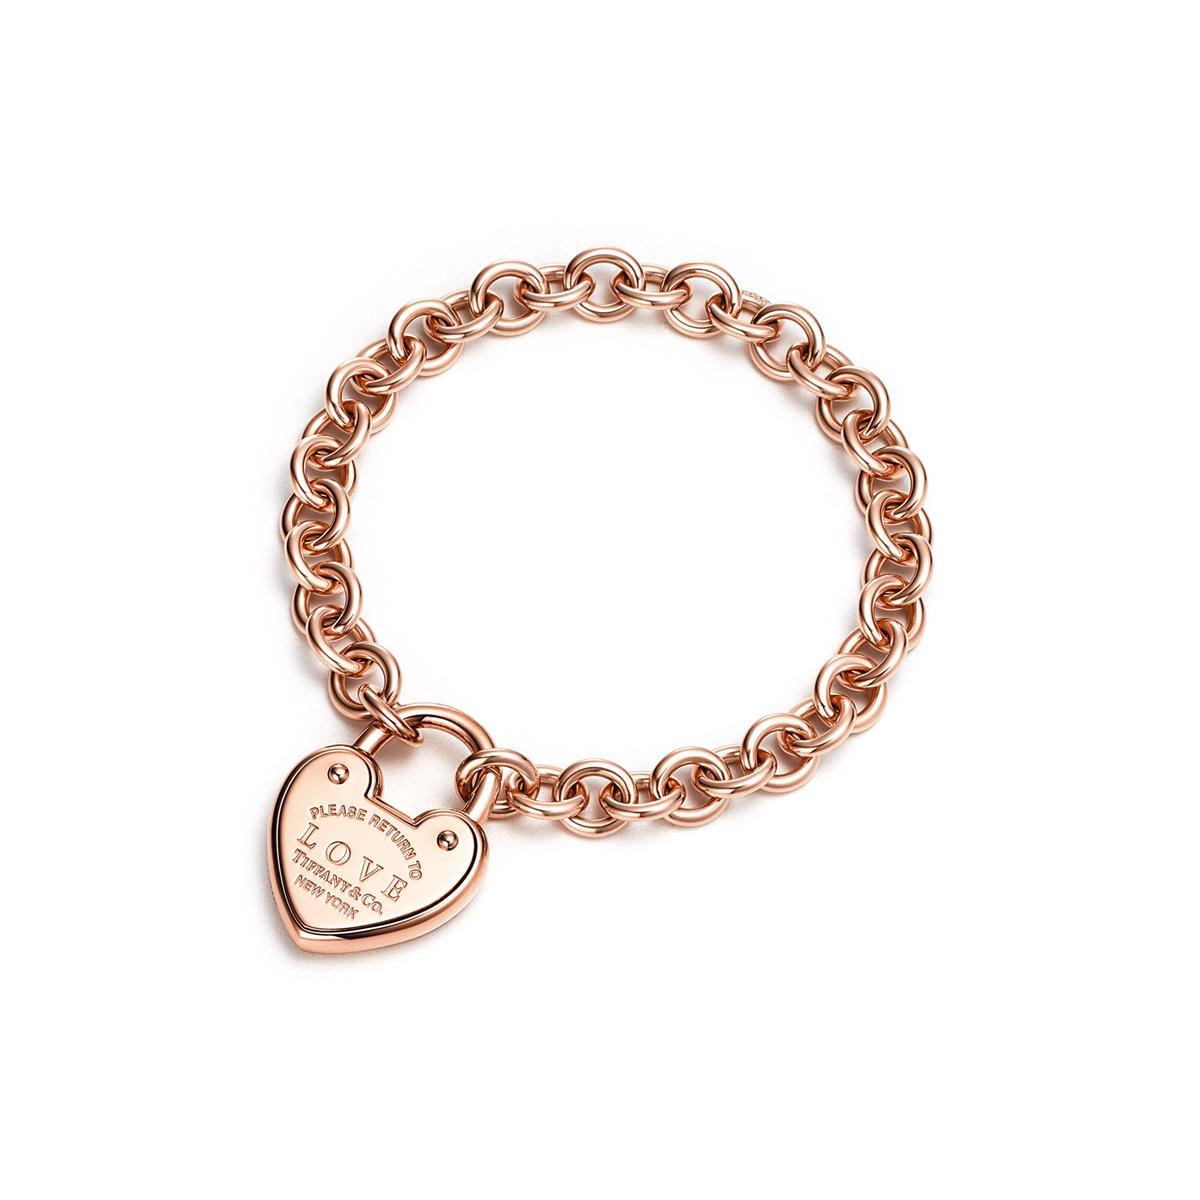 01_ Tiffany Return to Tiffany Love_36340401_bracelet (Copy)